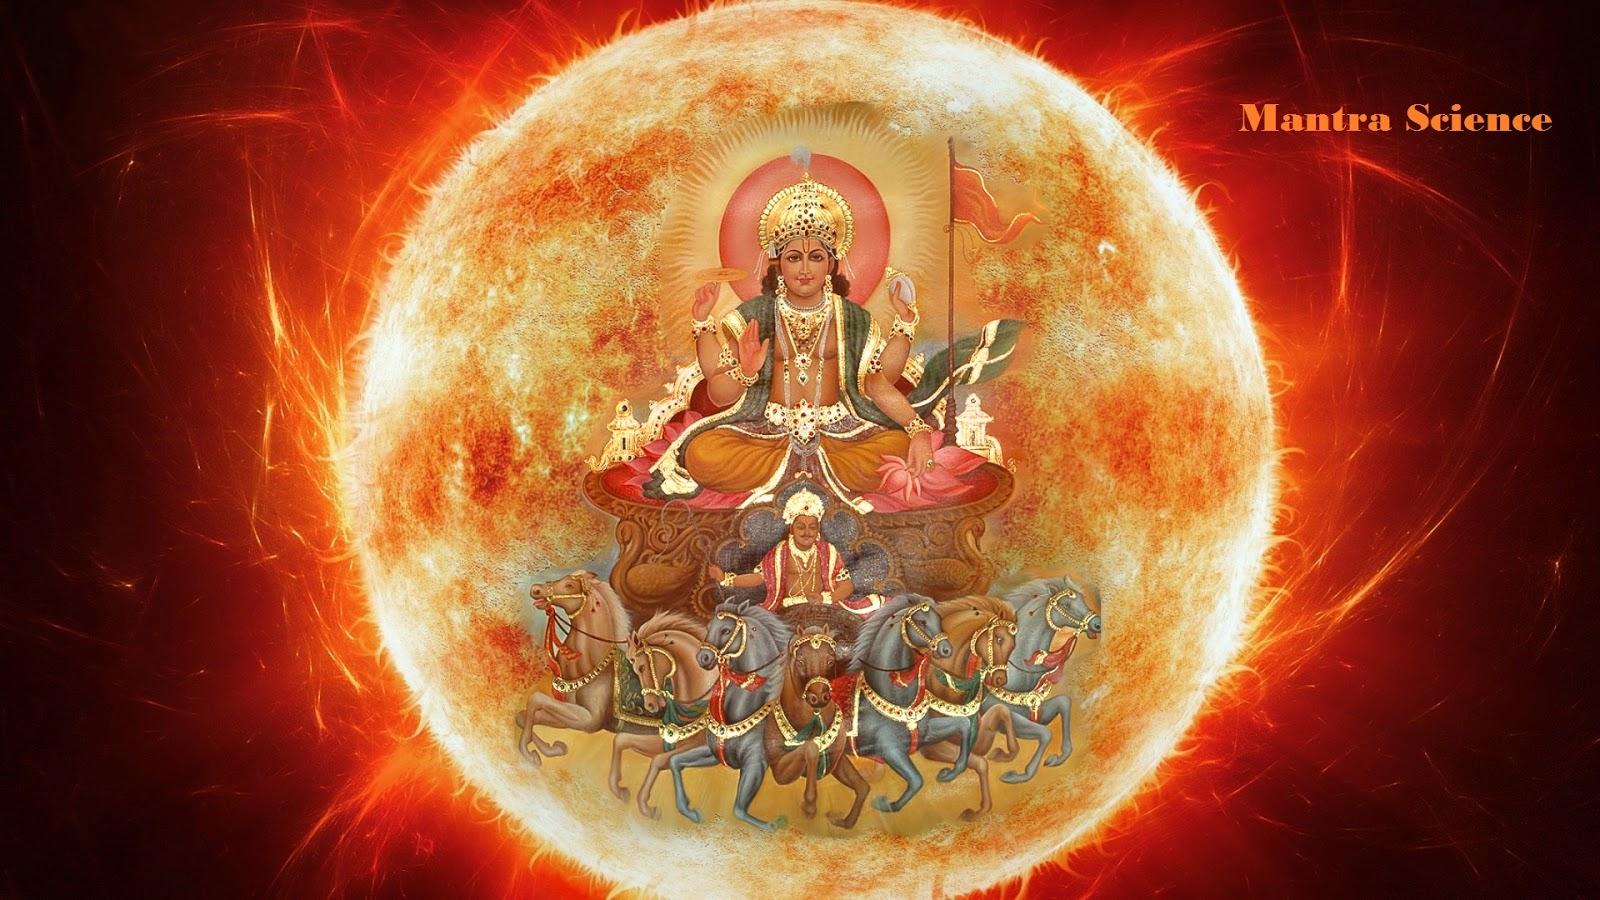 Mantra Science: Powerful Surya Beej Mantra